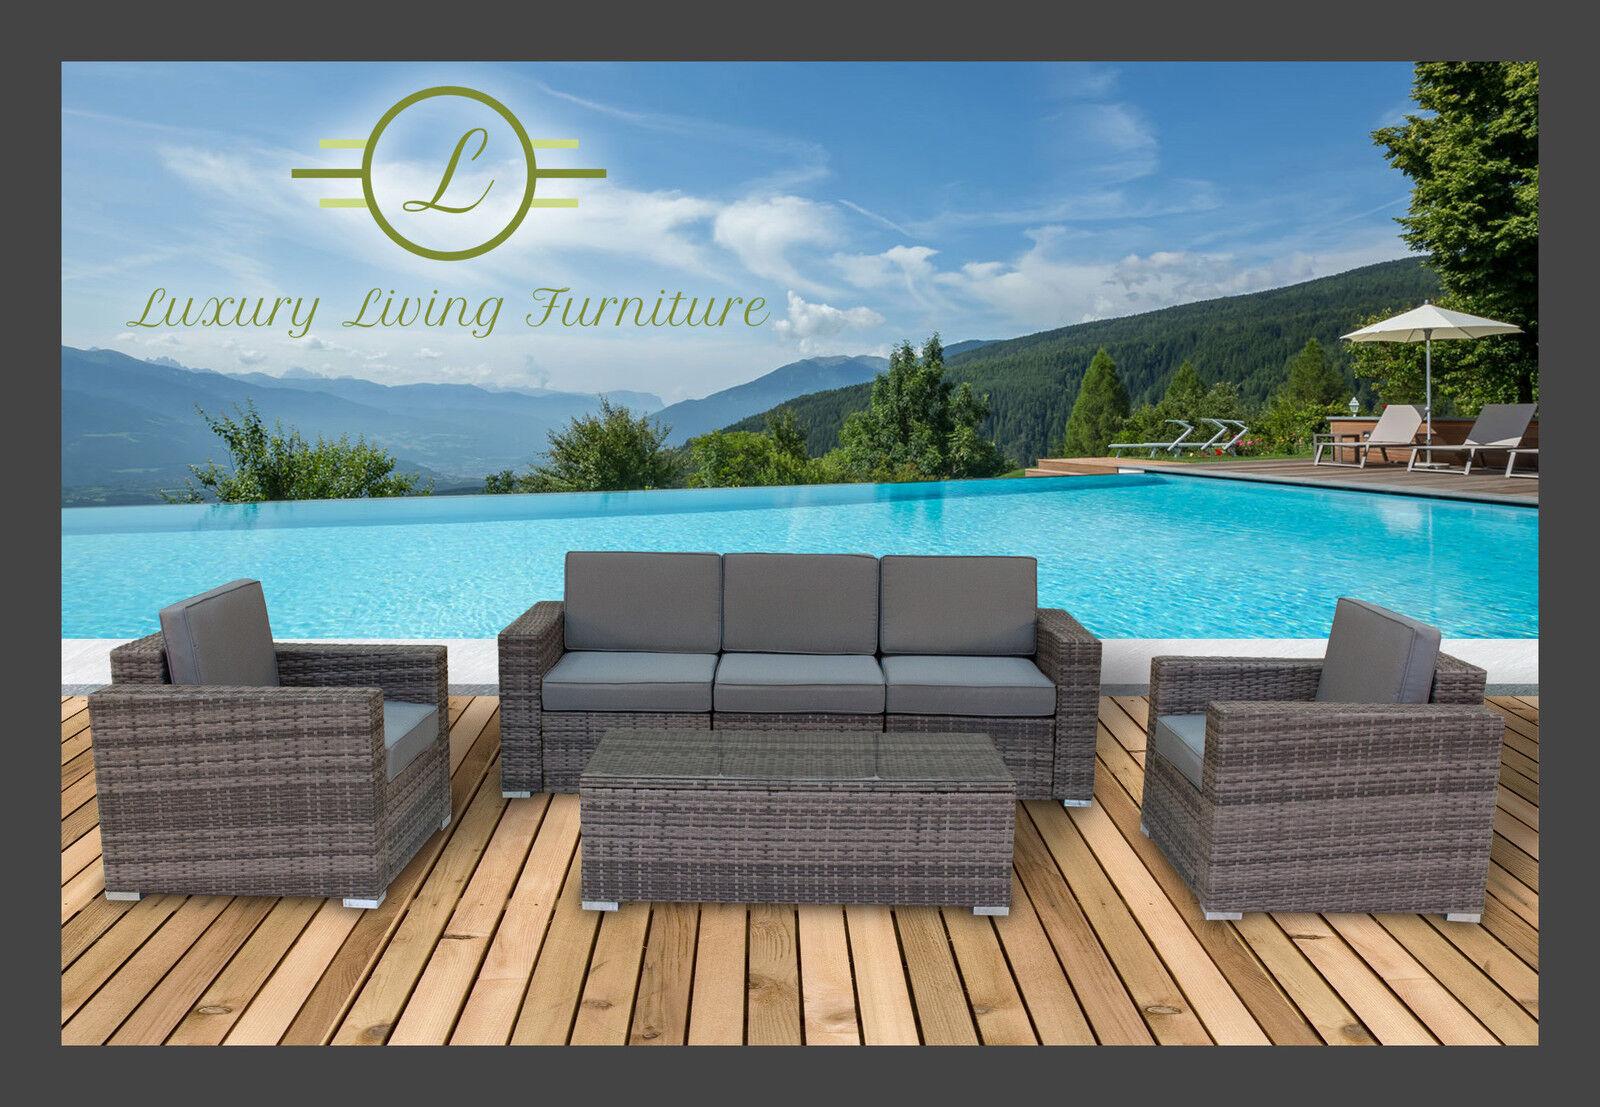 Luxury Living Furniture